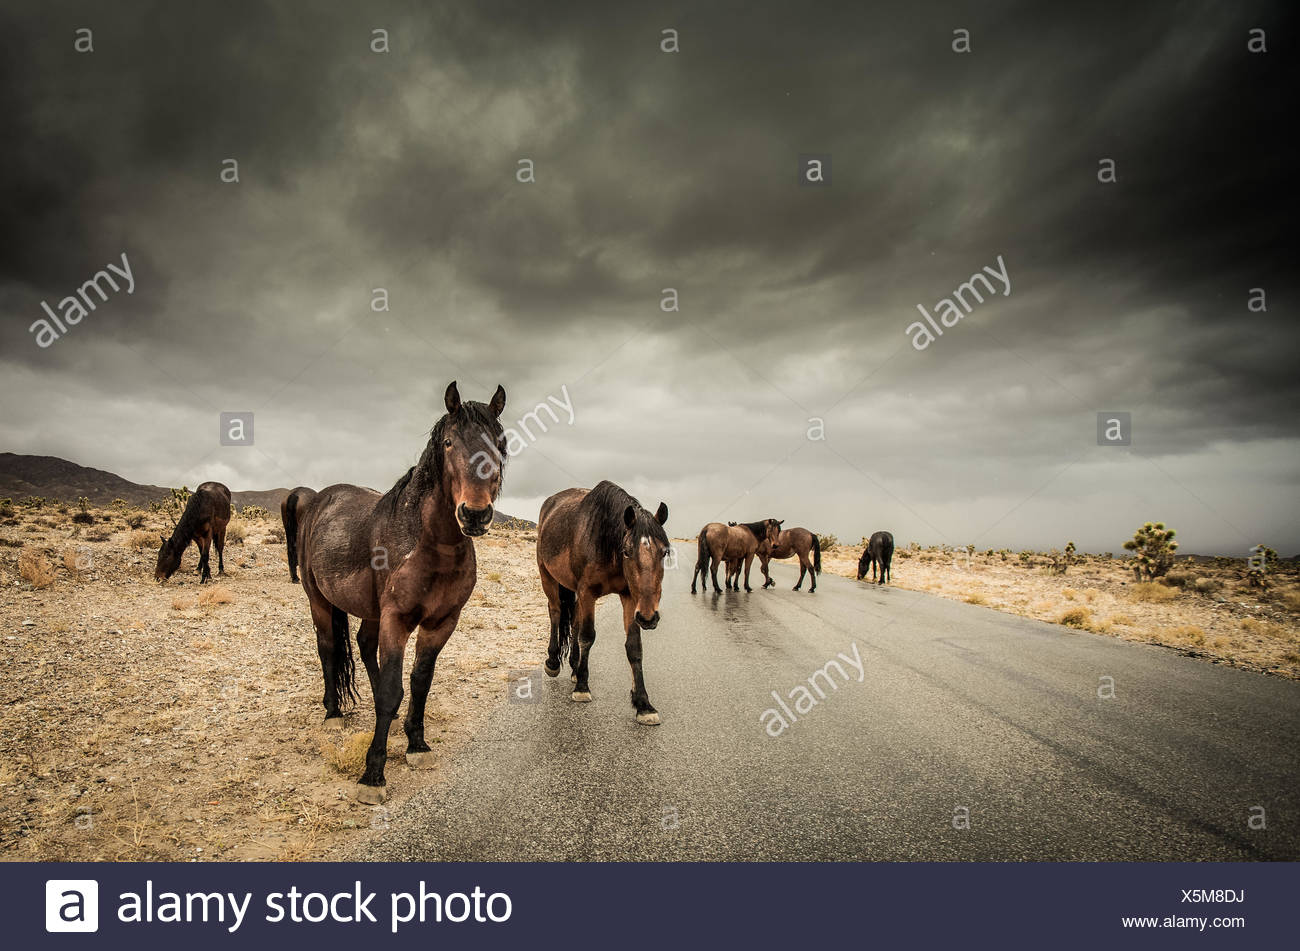 Herd of horses walking along road - Stock Image